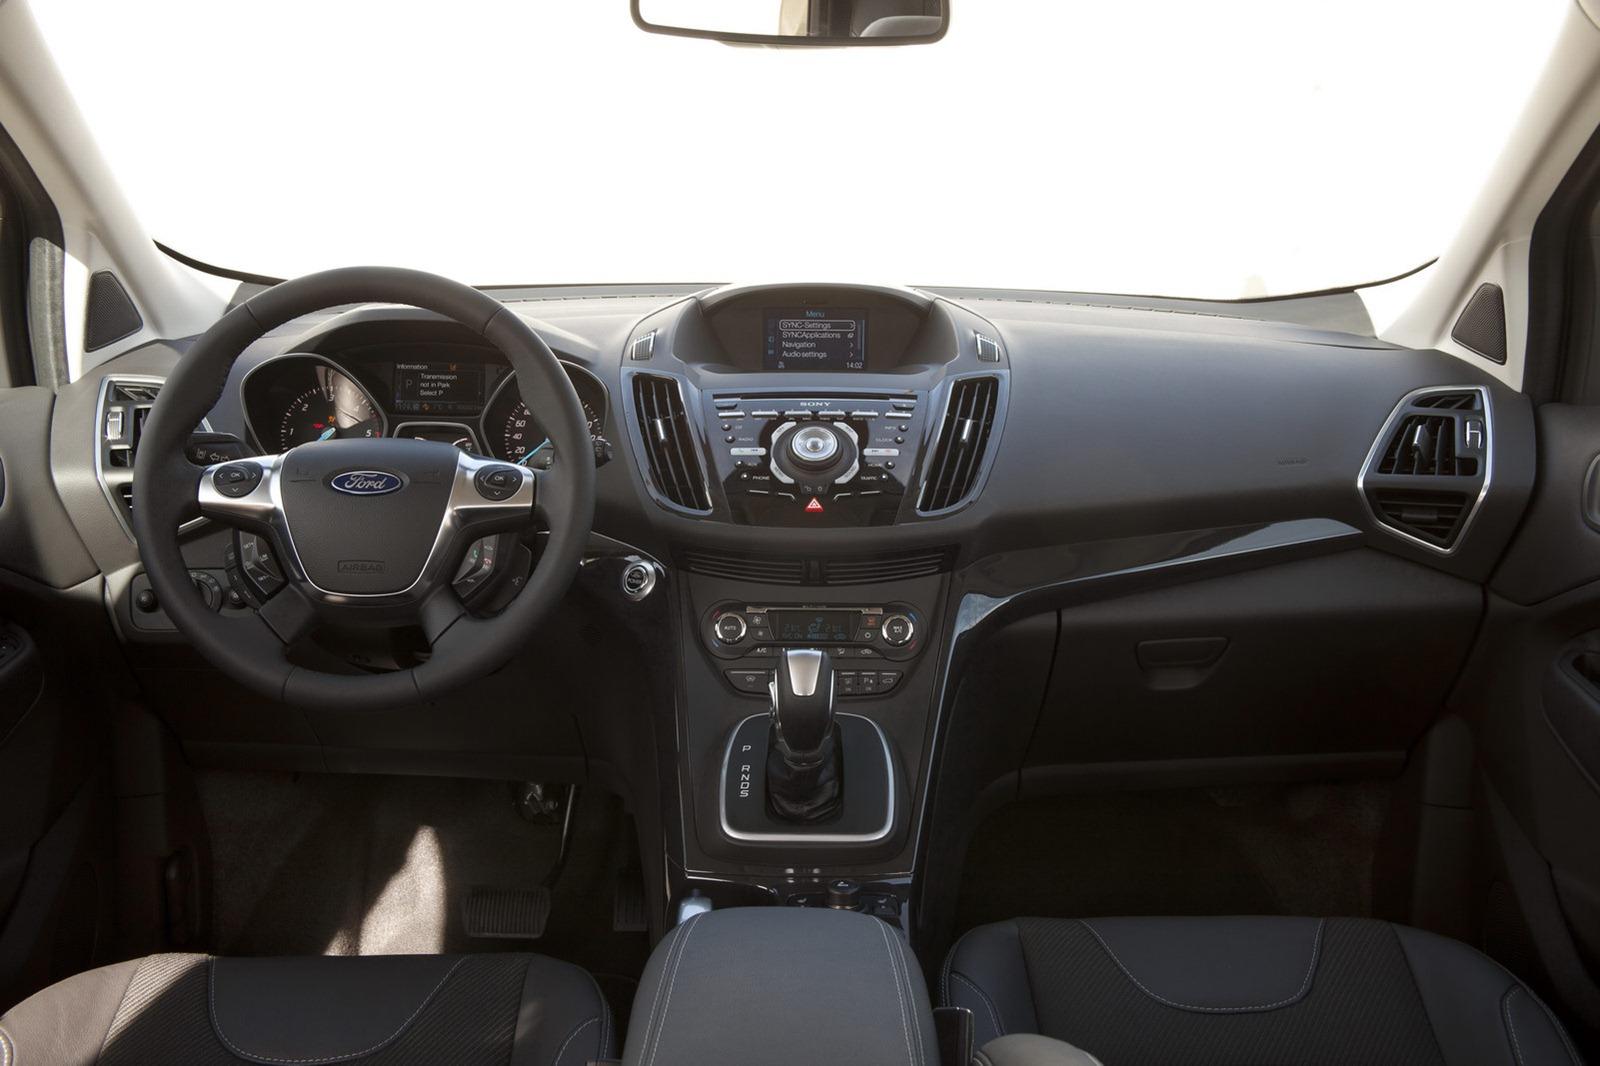 Форд куга Форд куга Форд куга Renault kangoo, техническая характеристика